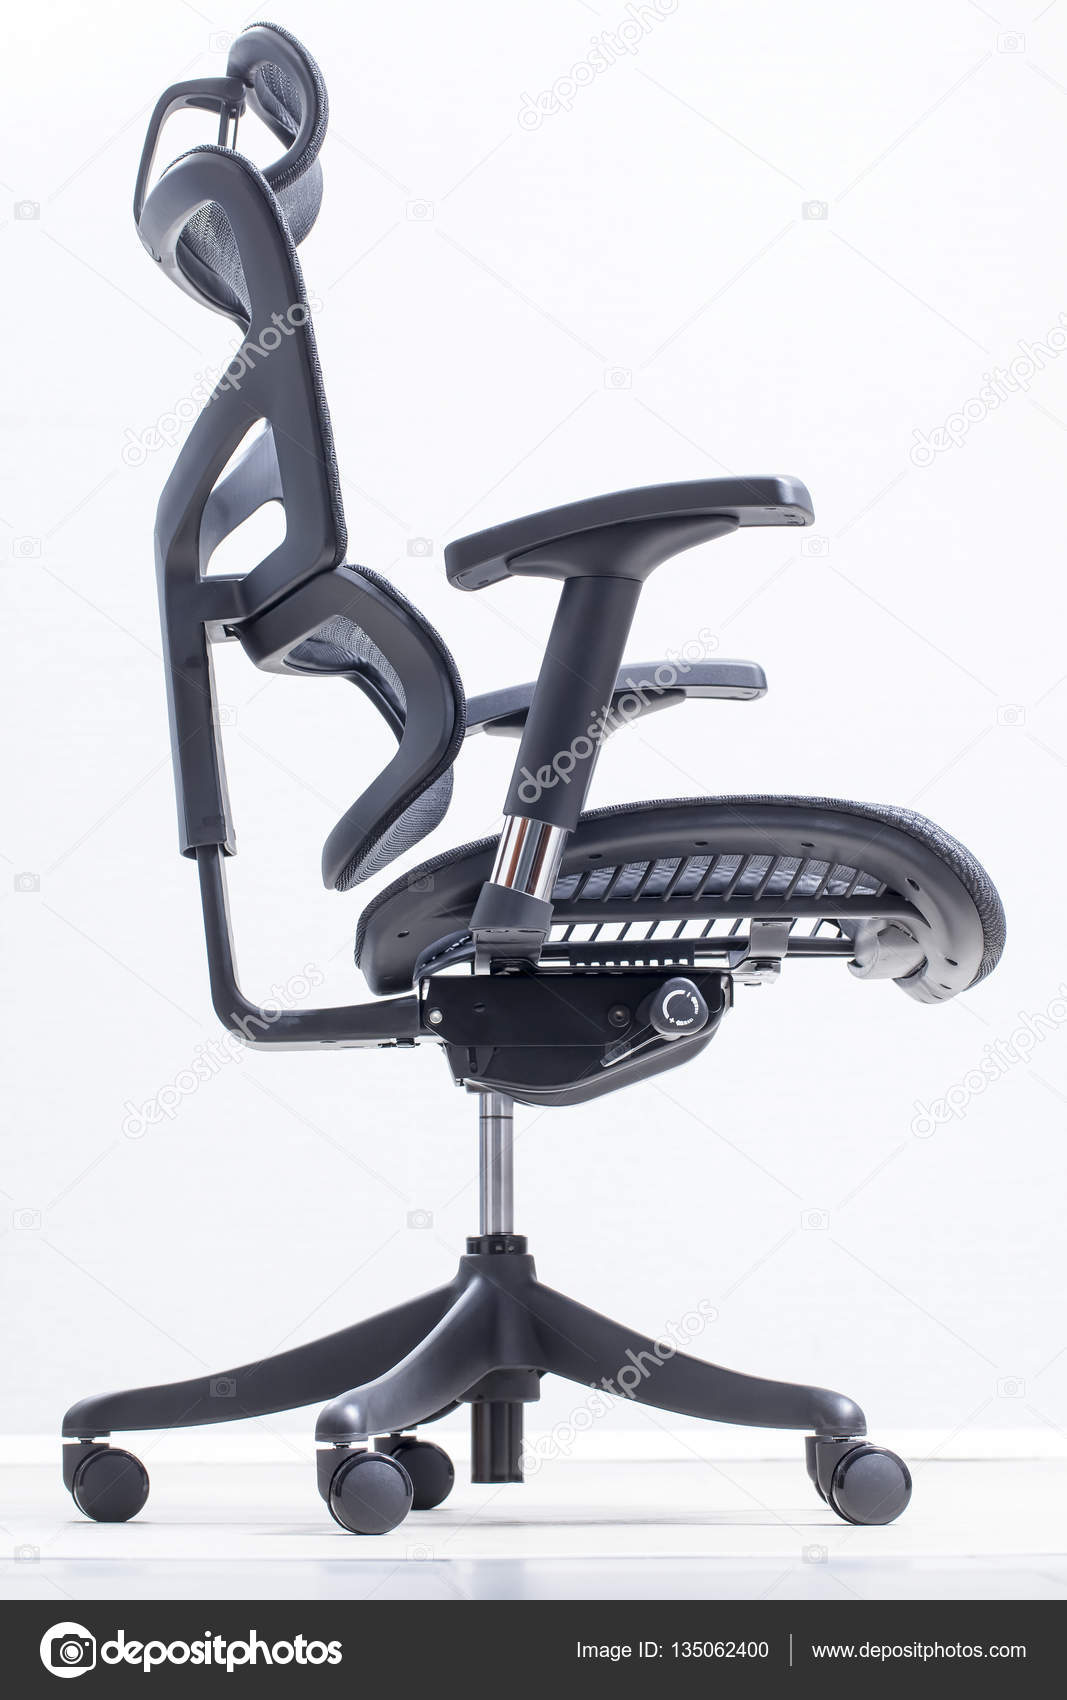 Sitio De Trabajo De Computadora Ergon Mica Silla Ortop Dica Foto  # Muebles Ergonomicos Para Computadora